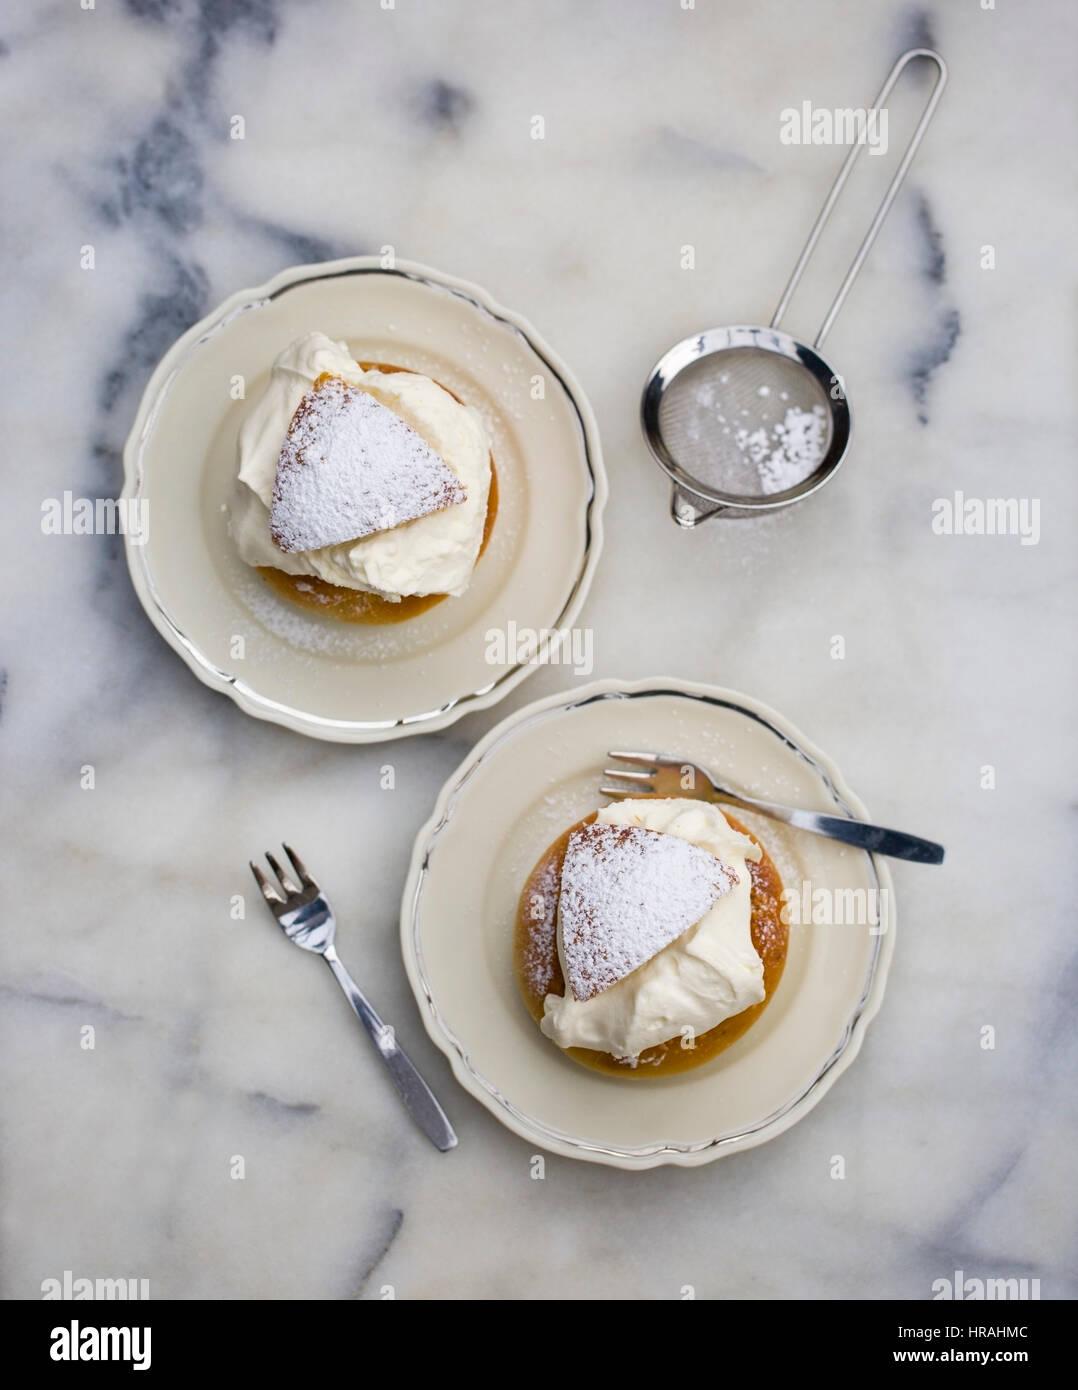 The Swedish Shrove Tuesday pastry semla - Stock Image